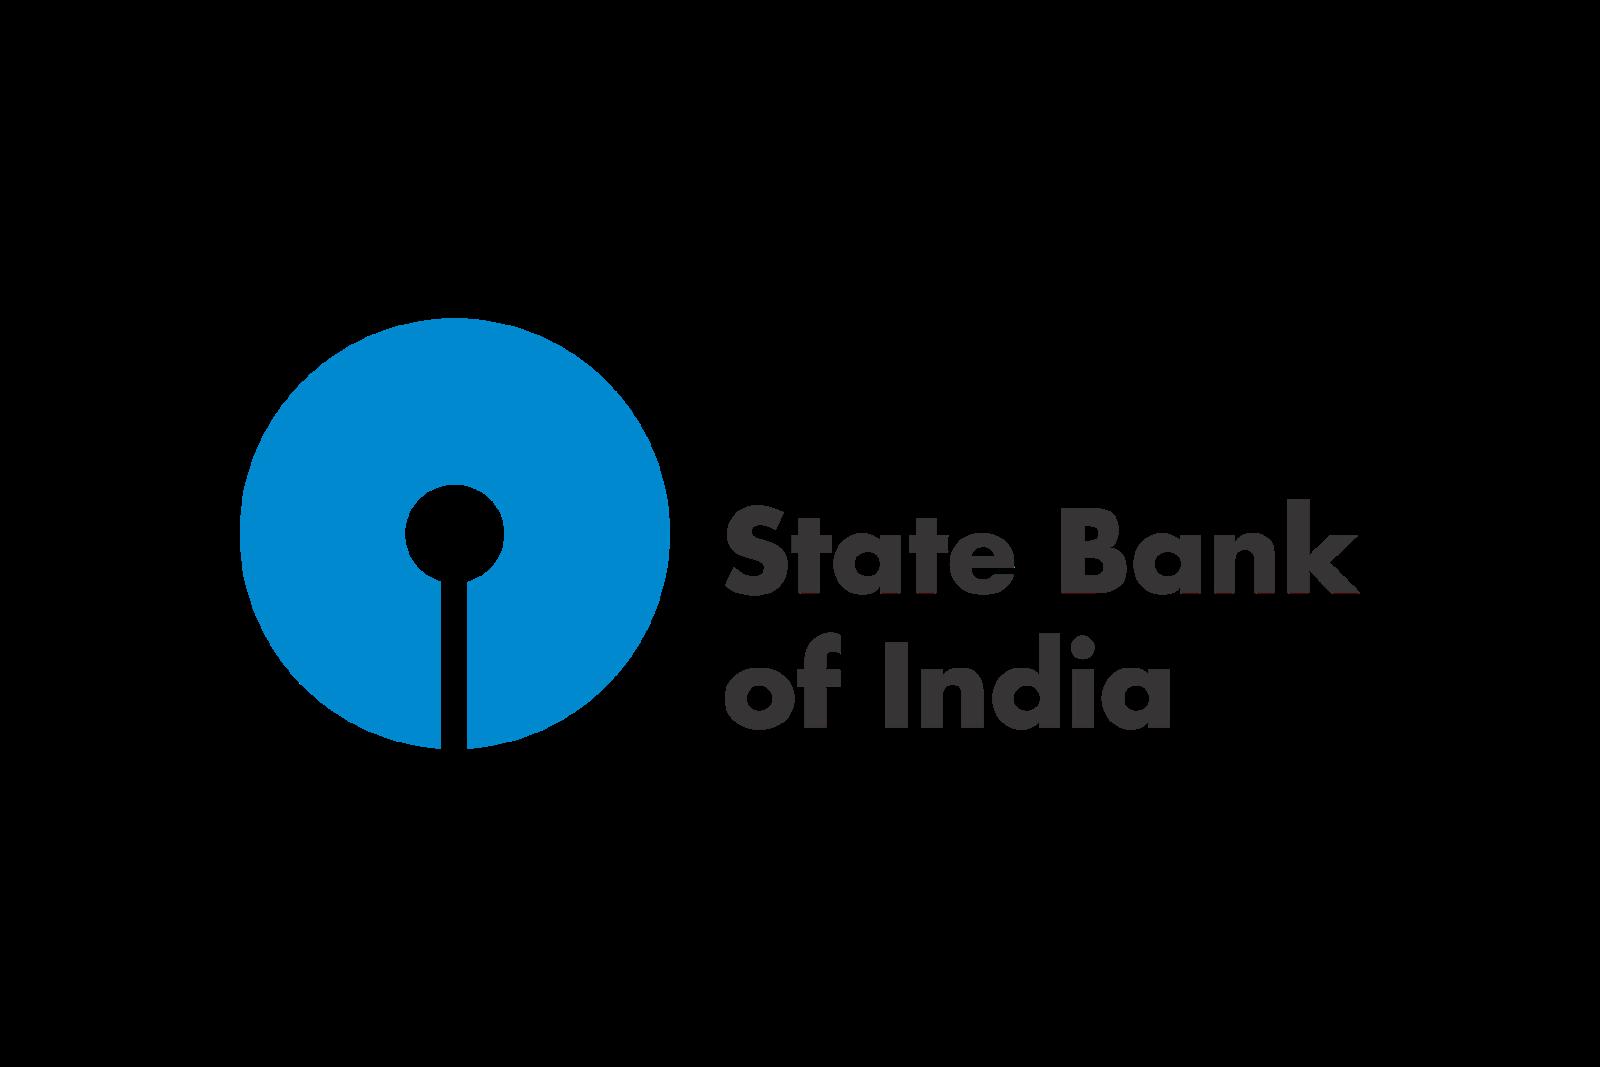 State Bank of India Logo